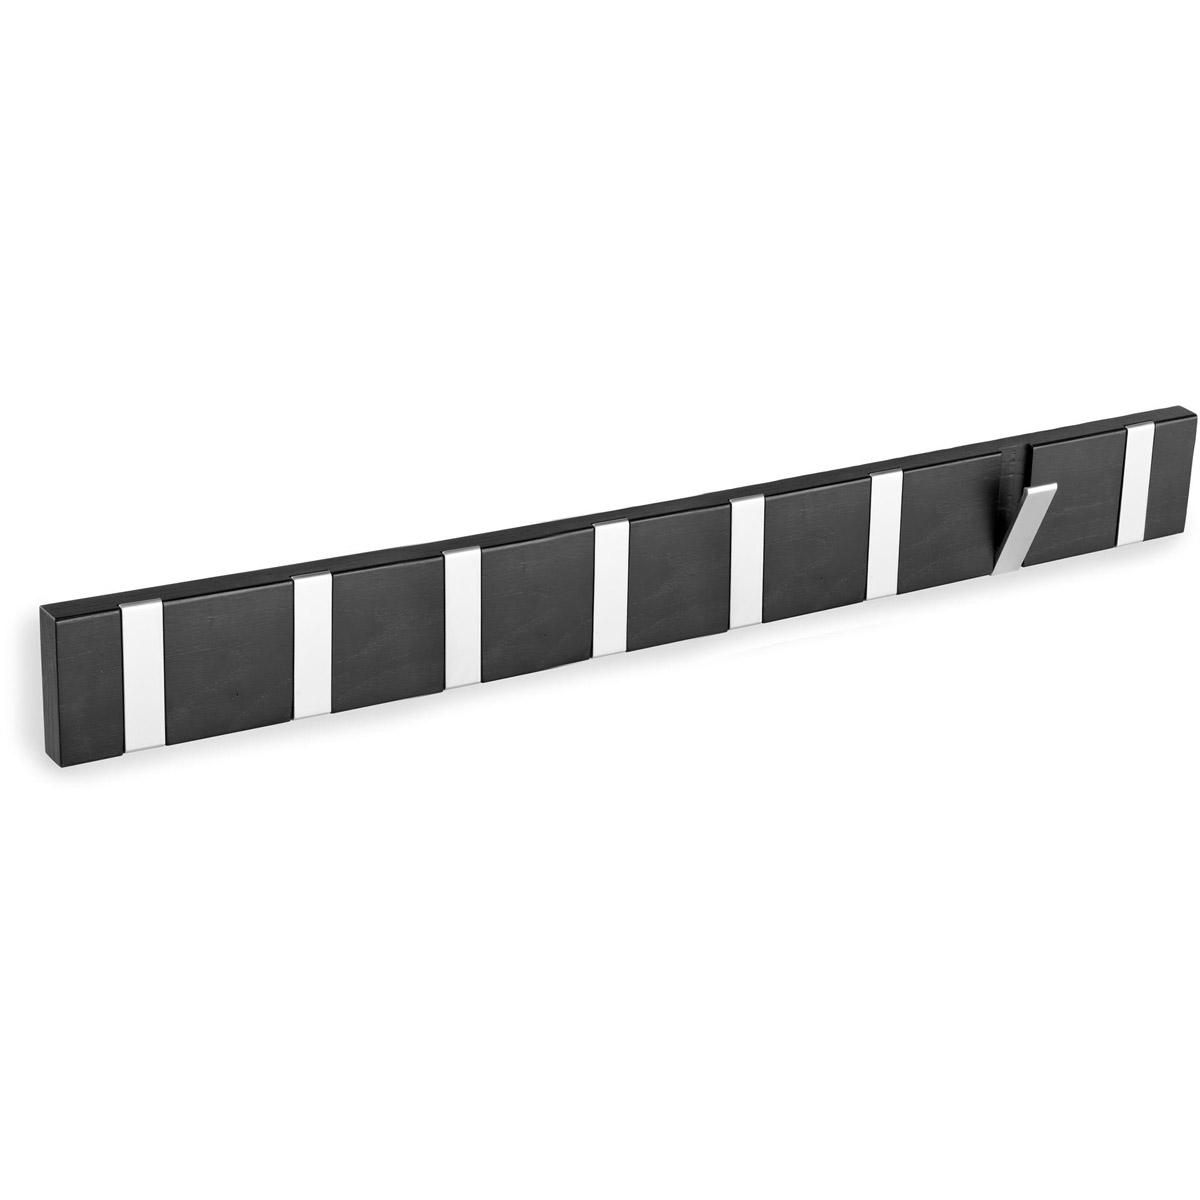 Confetti kroklist 8 flipkrokar B70 svart